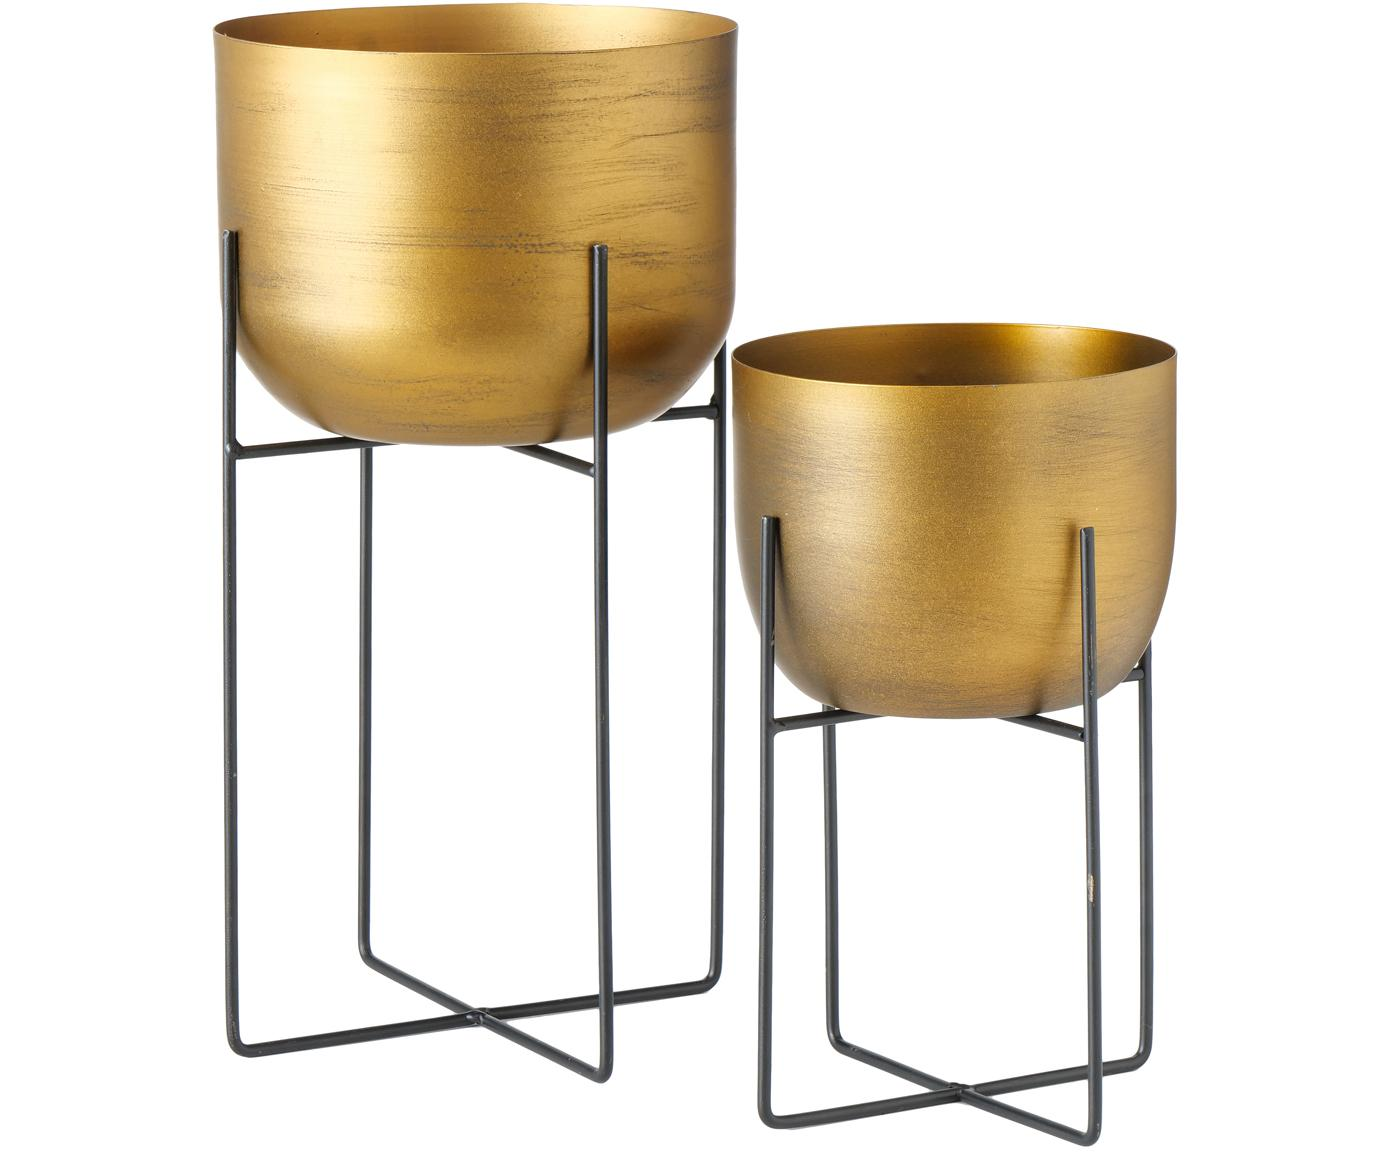 Set 2 portavasi Gadal, Metallo, Ottonato, Diverse dimensioni